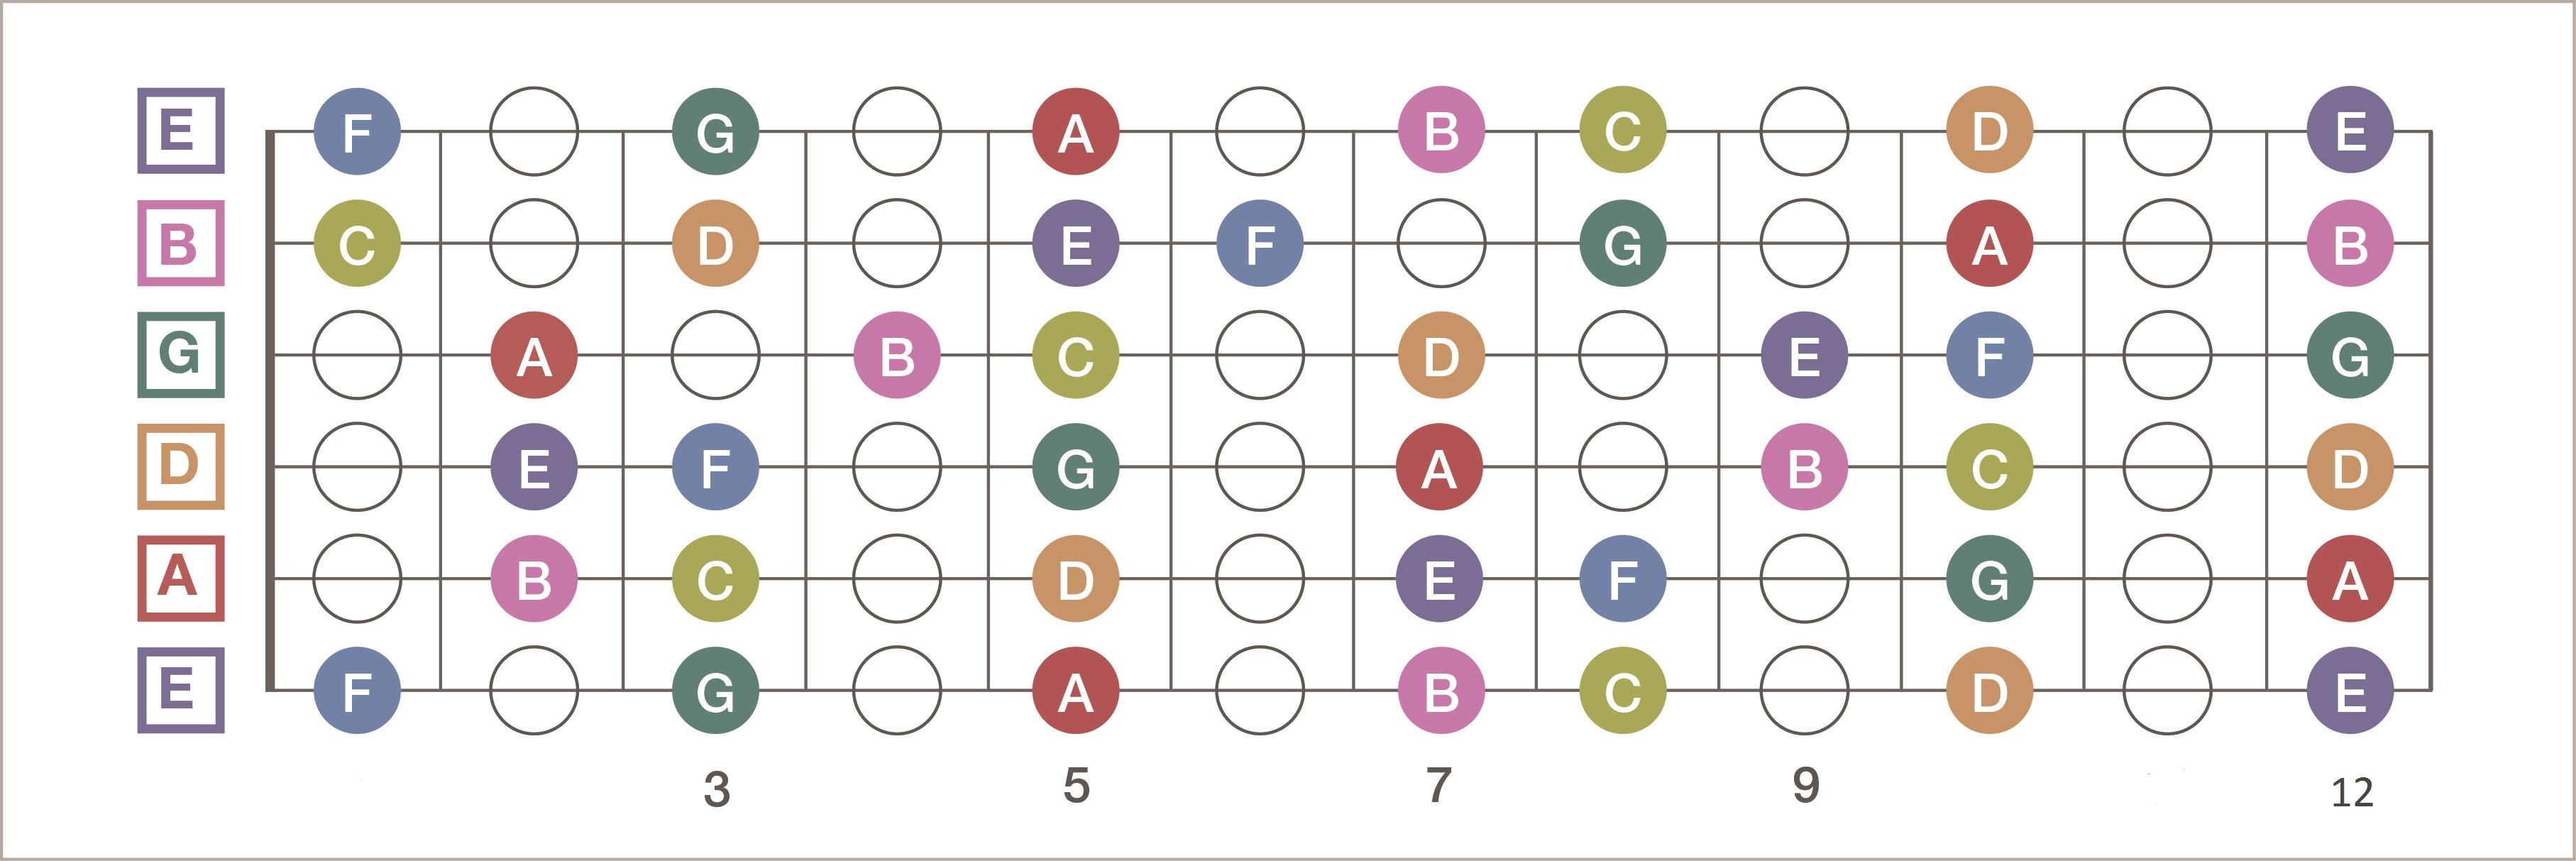 Guitar Stuff: Here's a Fretboard Diagram to Help You ...